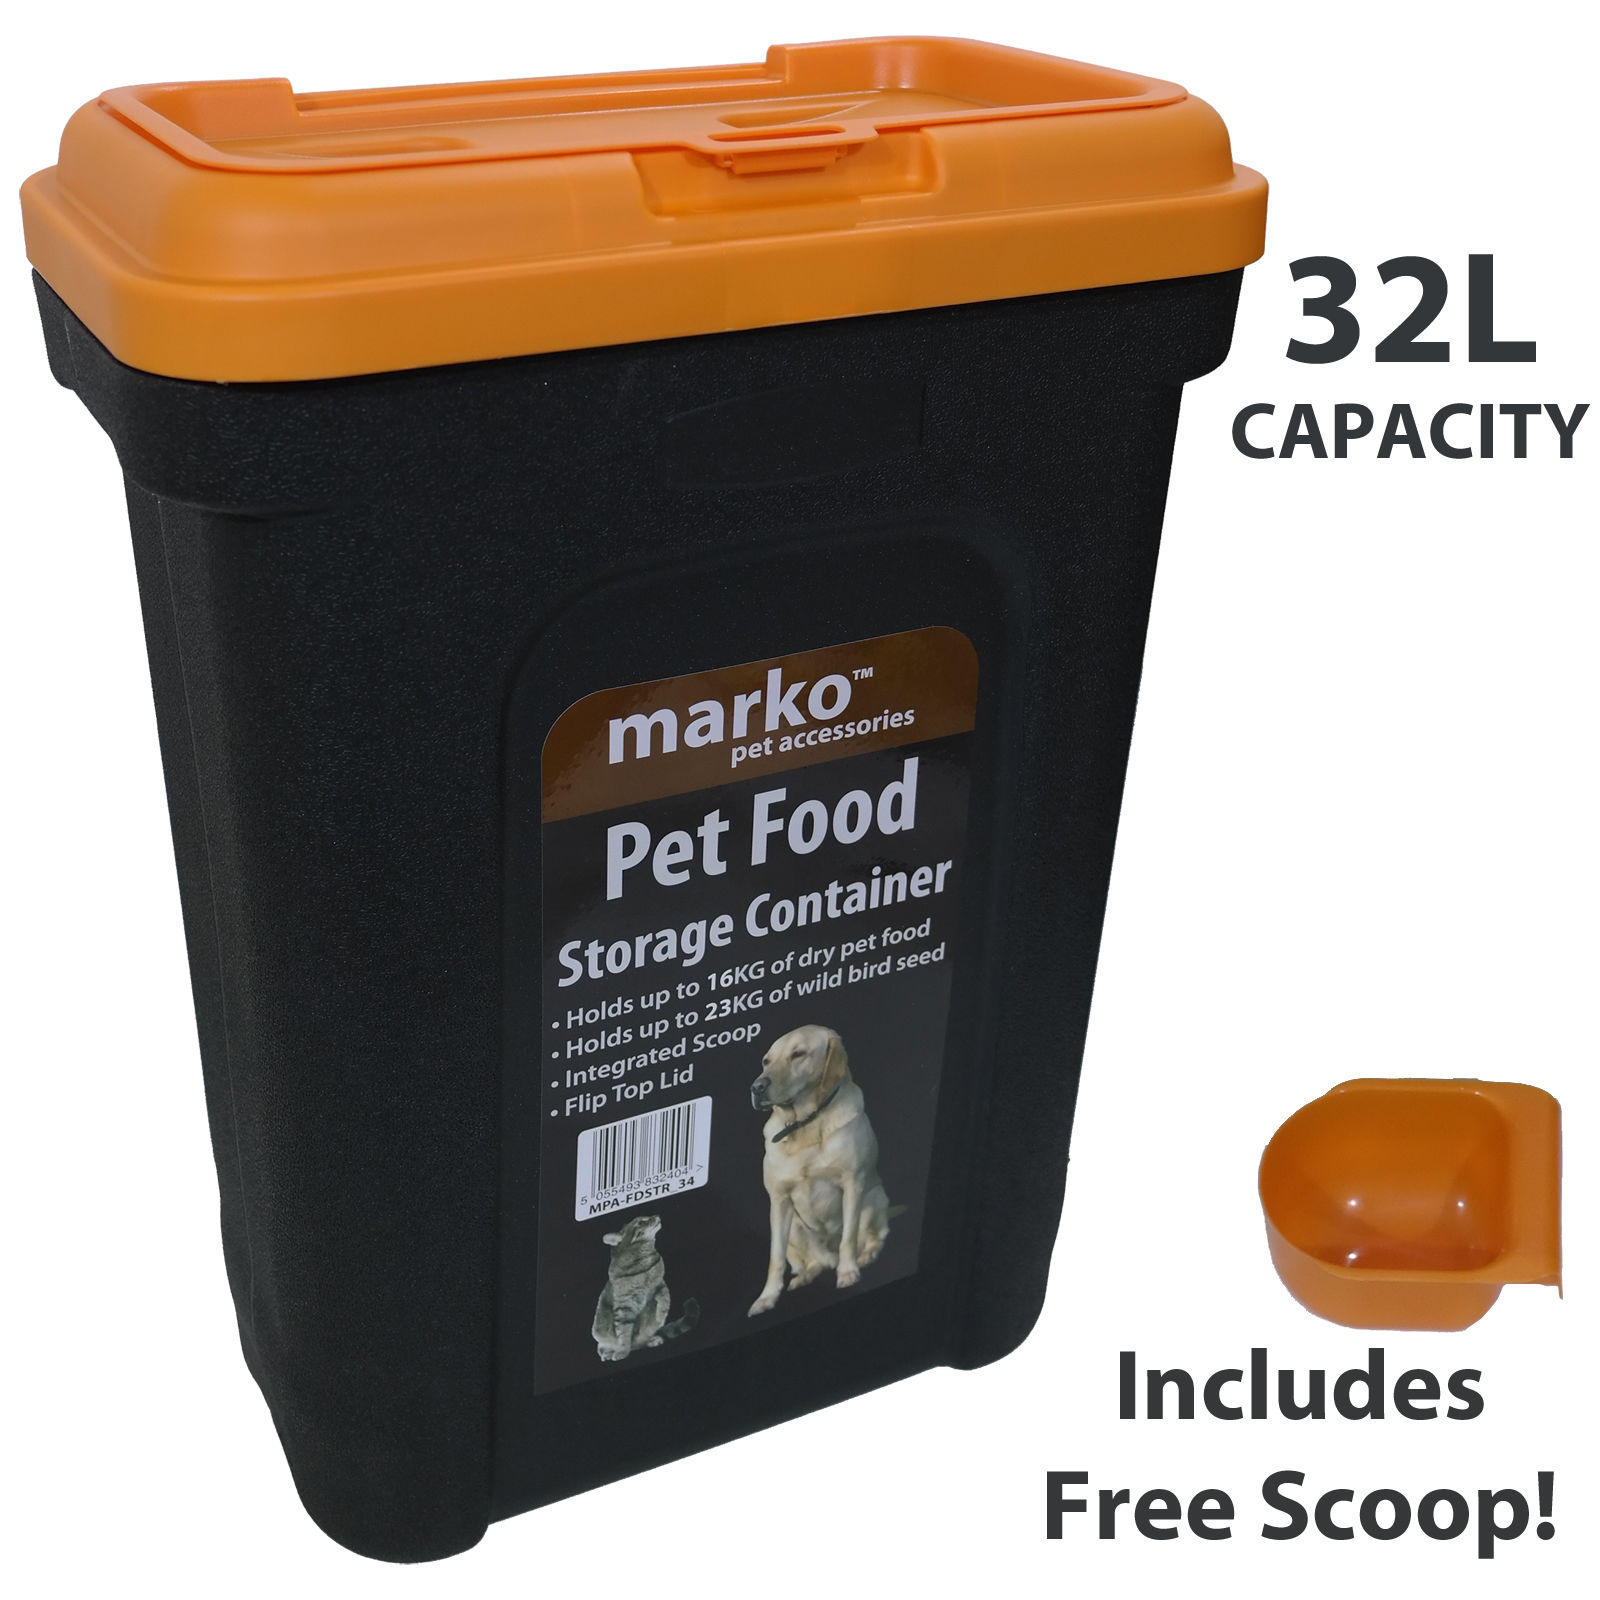 32l Large Pet Food Container Dog Cat Animal Storage Bin 16kg Dry